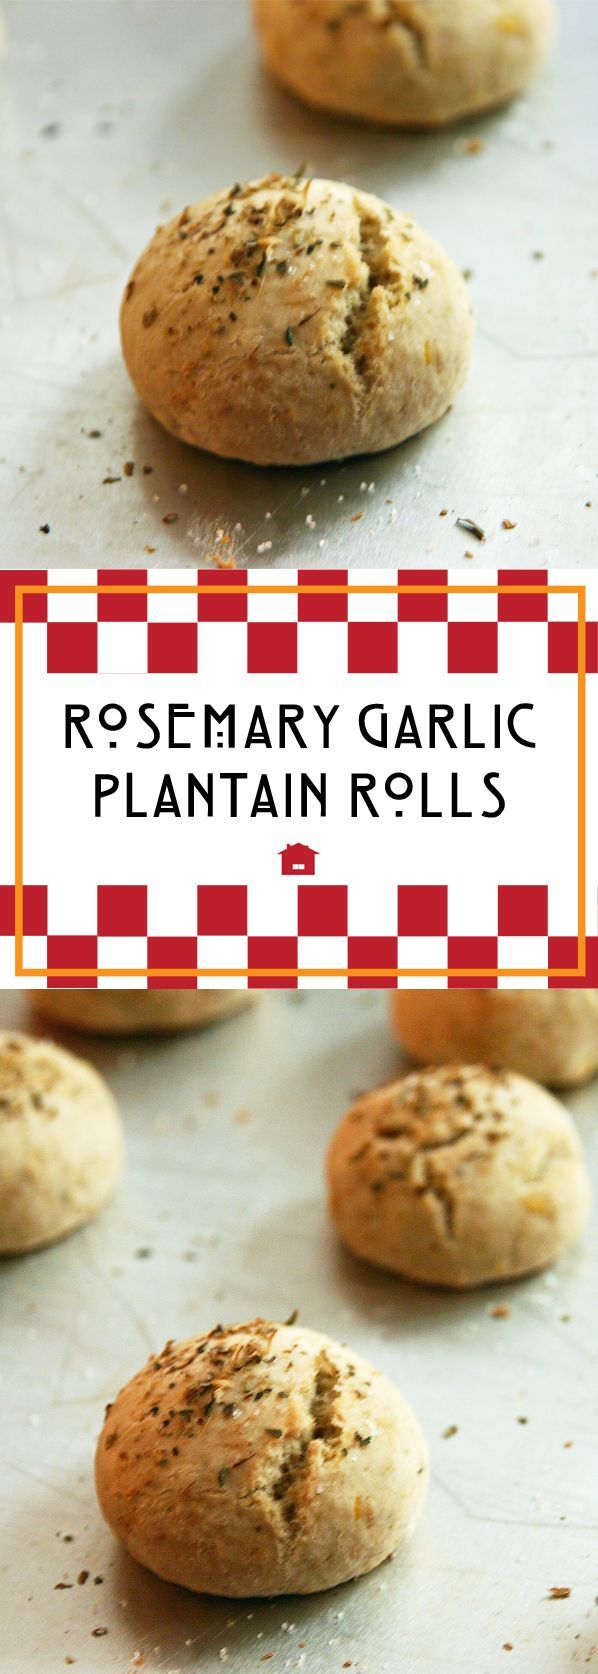 Rosemary Garlic Plantain Rolls